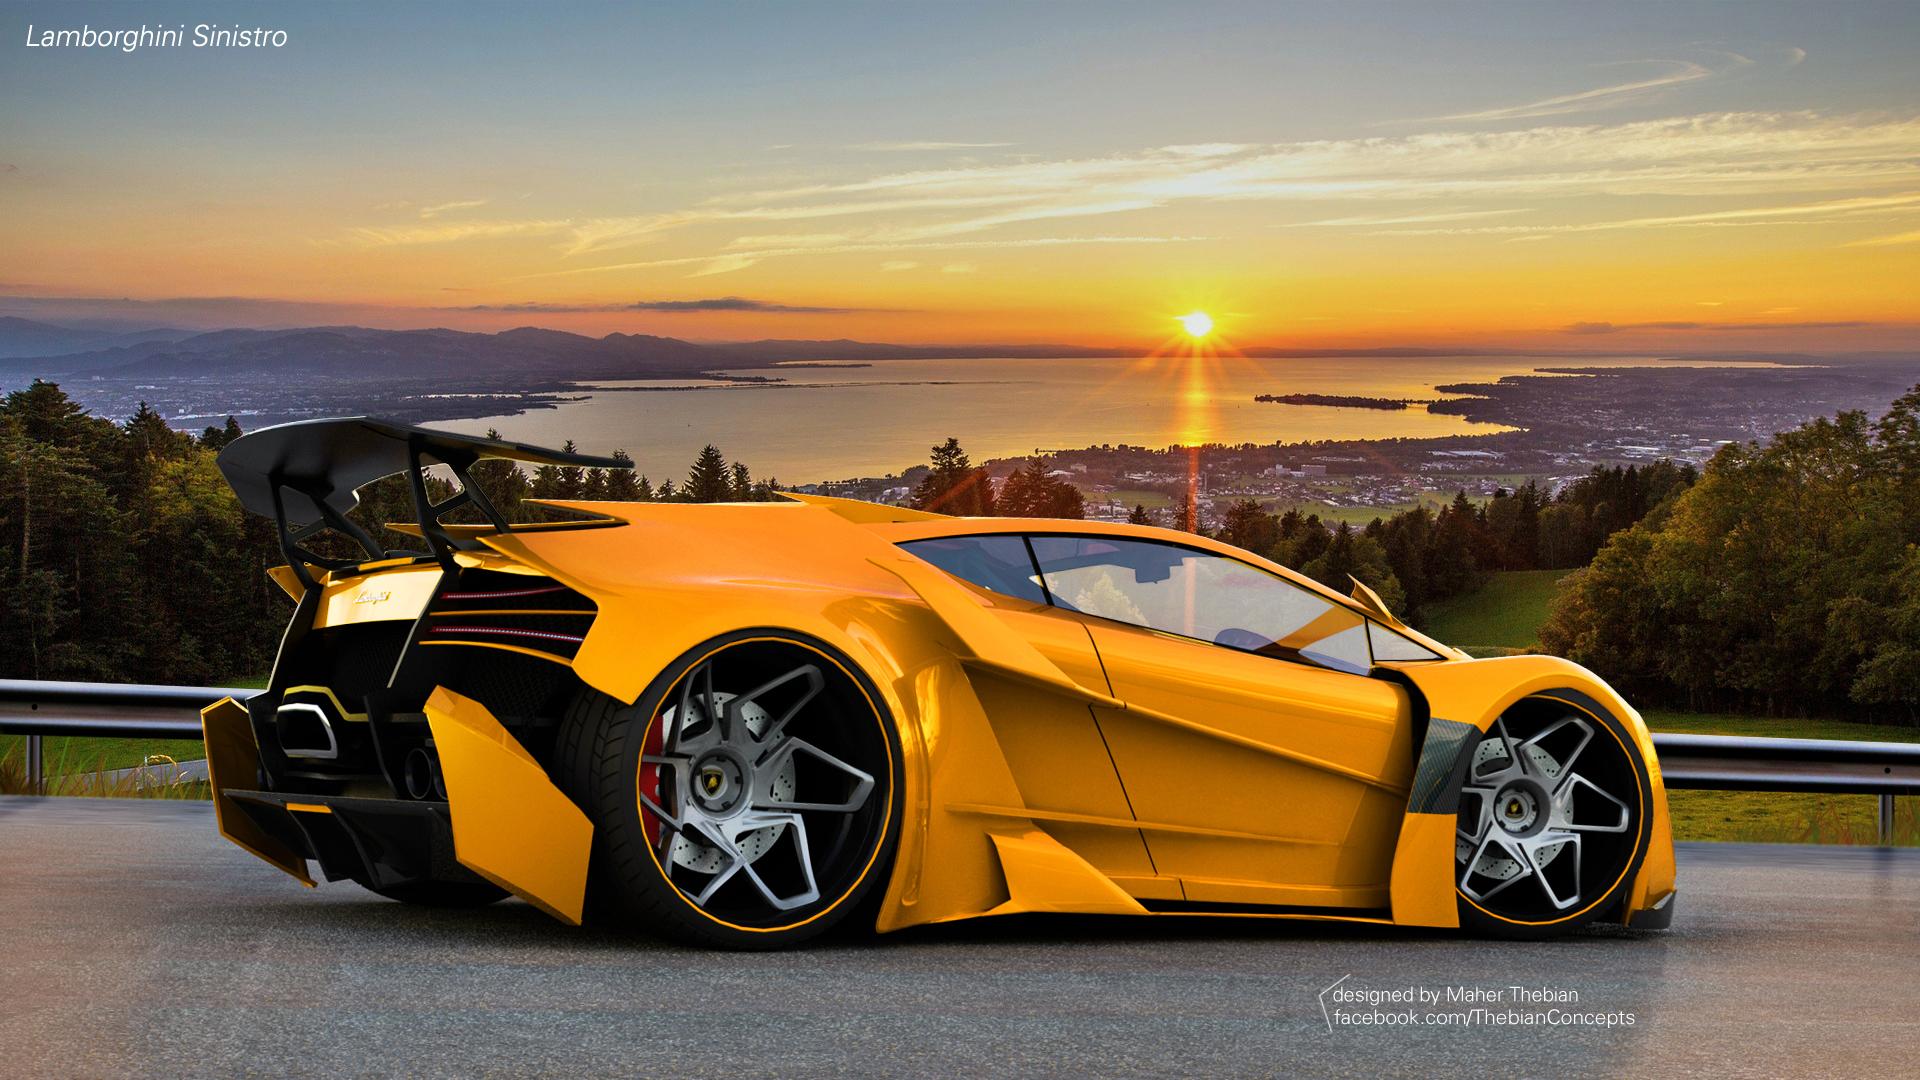 2 Lamborghini Sinistro Fondos De Pantalla HD